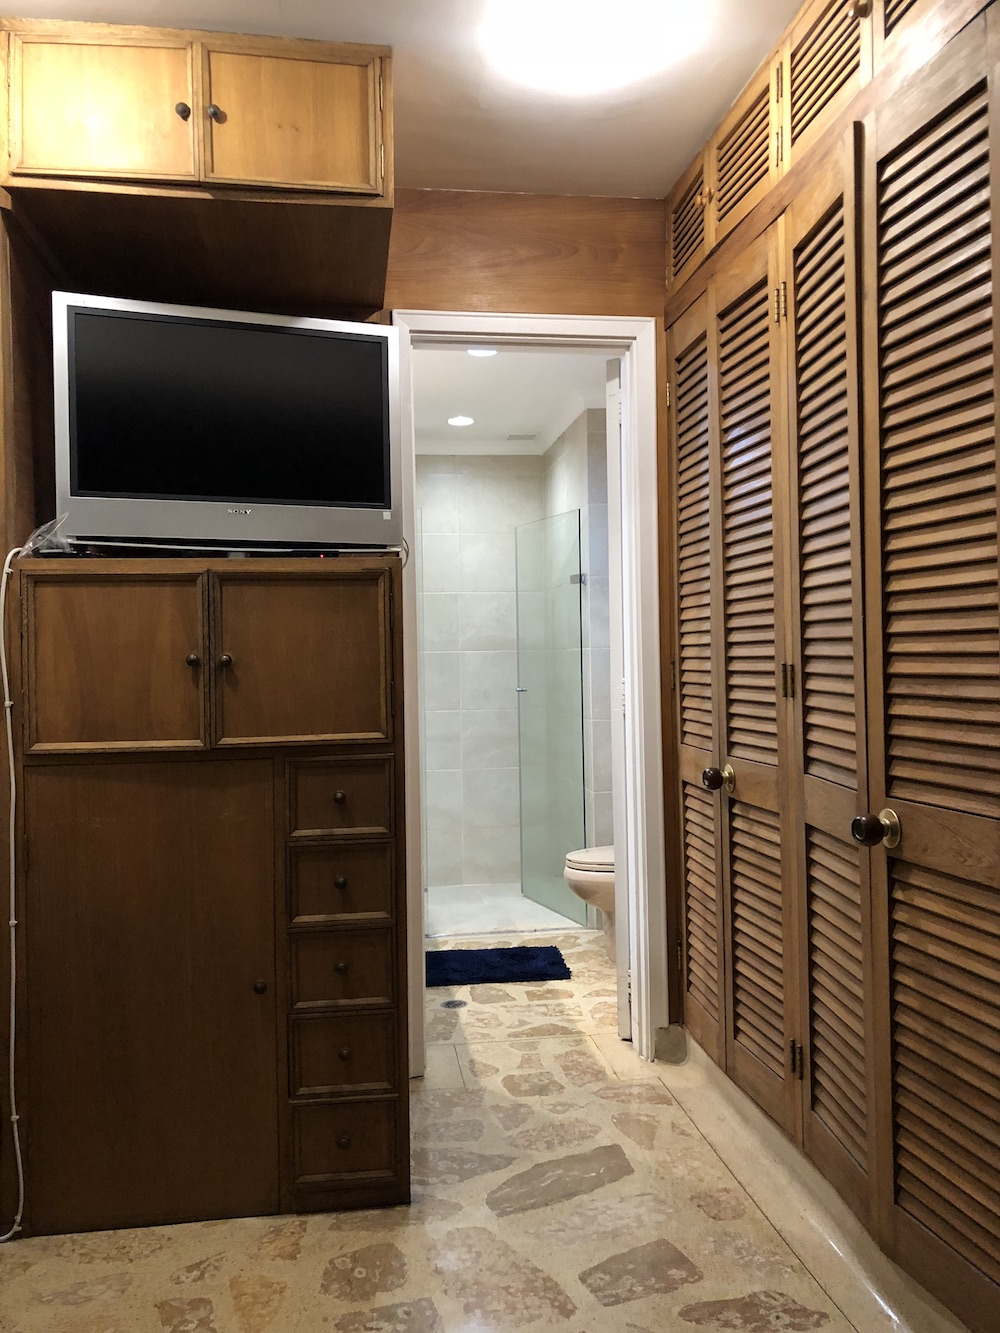 TV, master bathroom